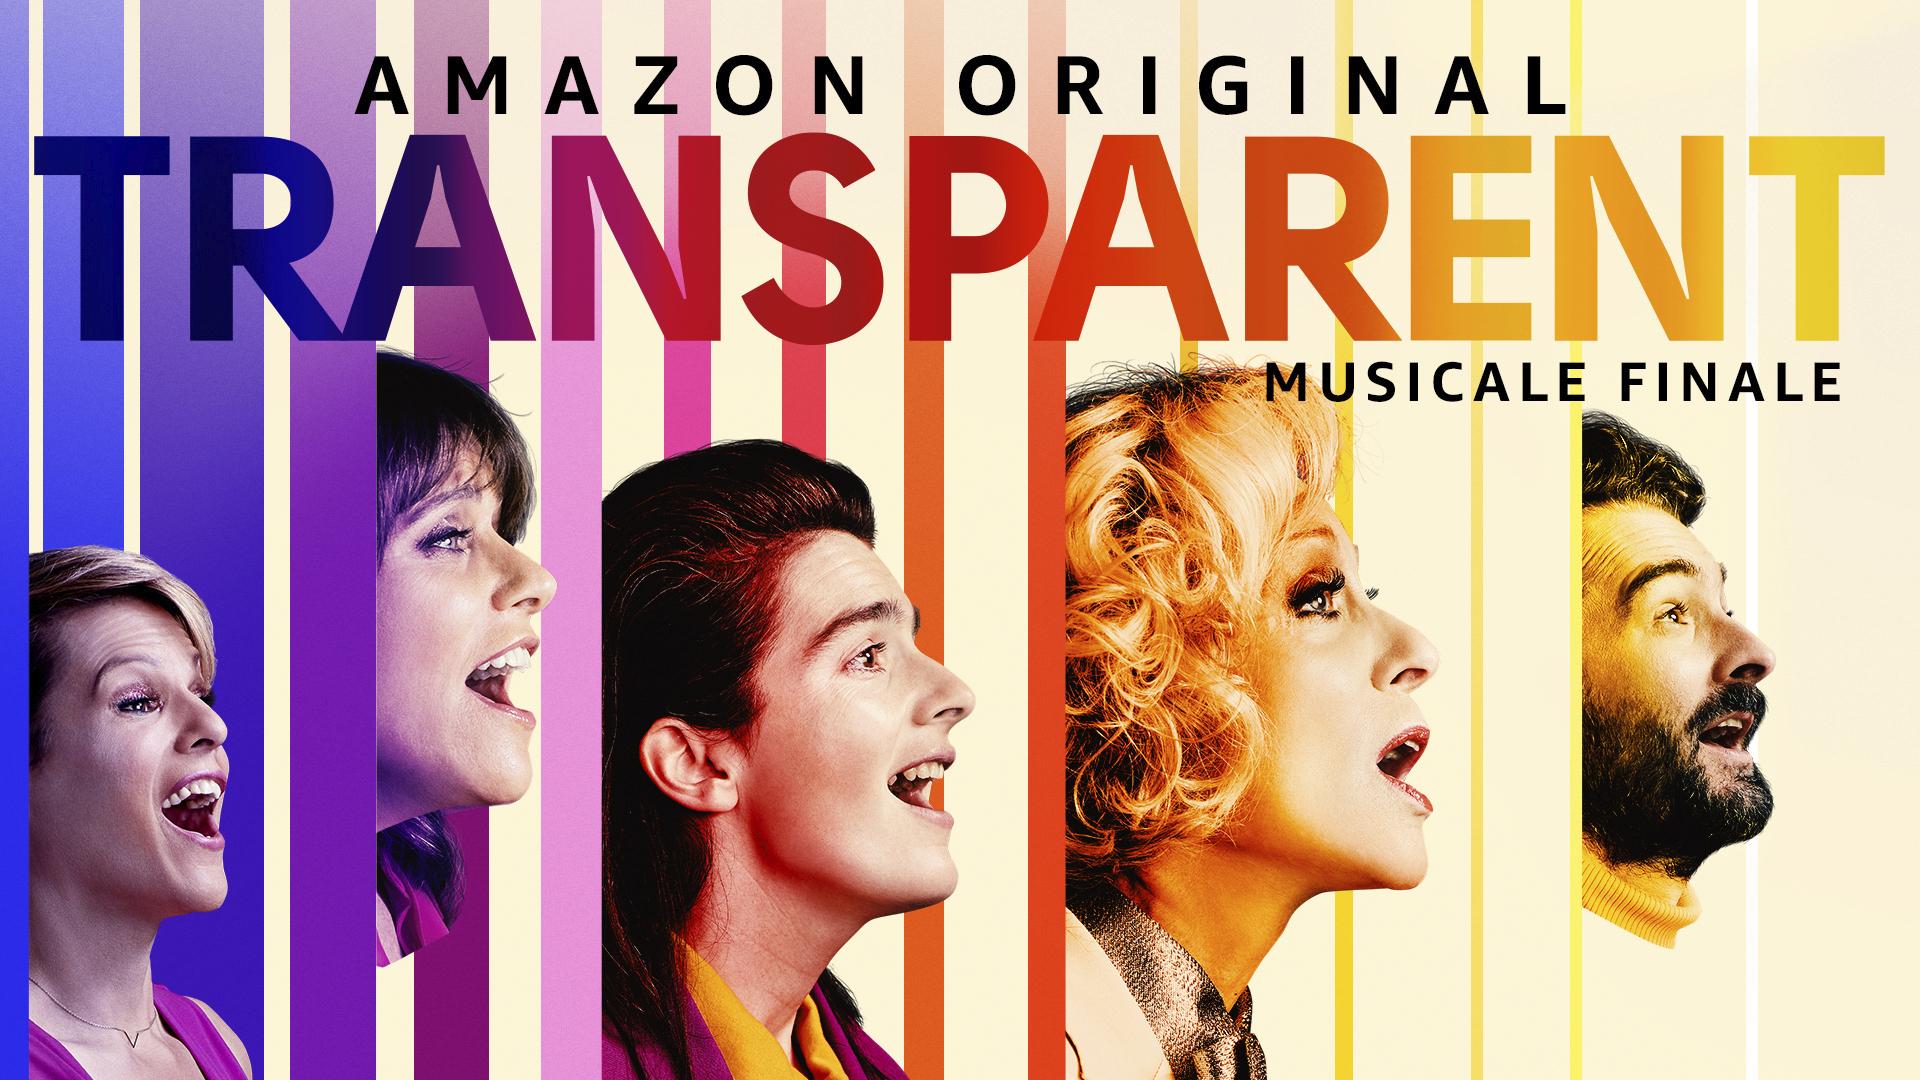 'Transparent: Musicale Finale' teaser art. [Amazon Prime Video]